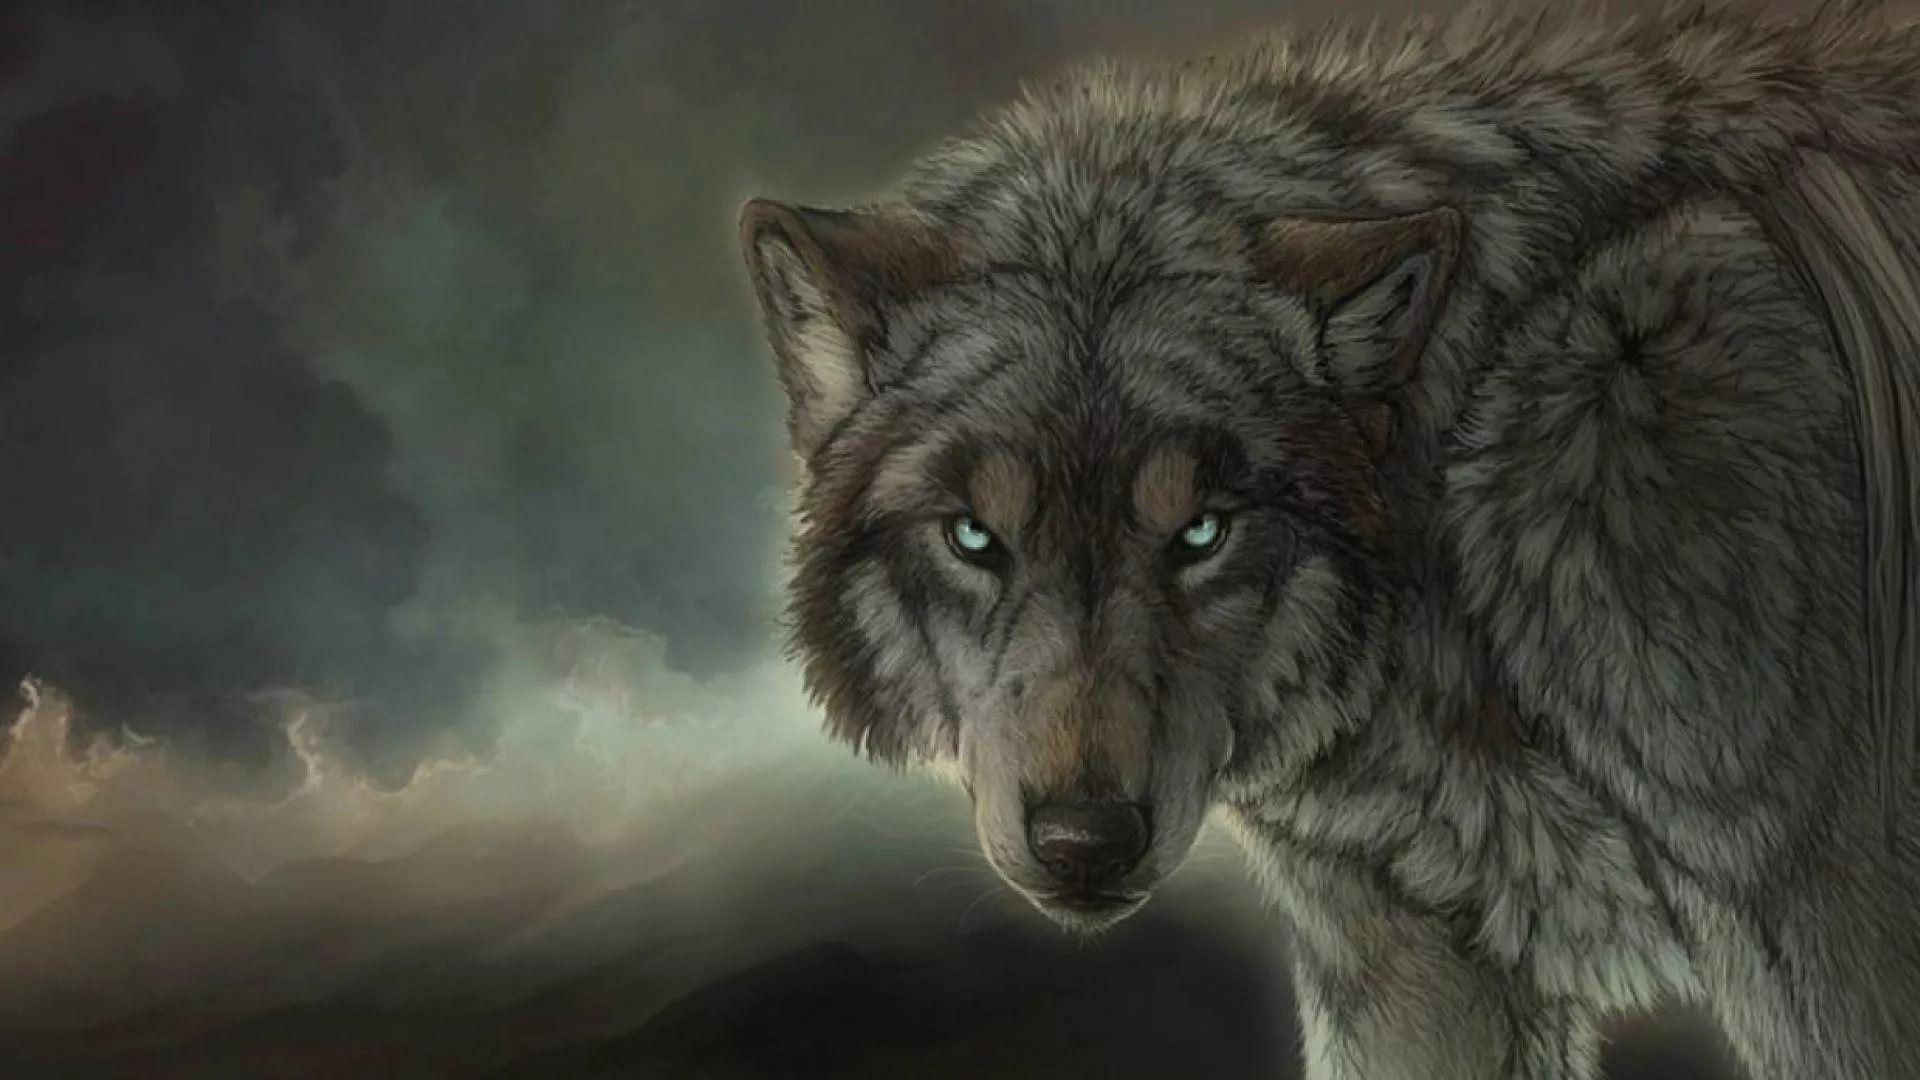 Cool Wolf hd wallpaper download